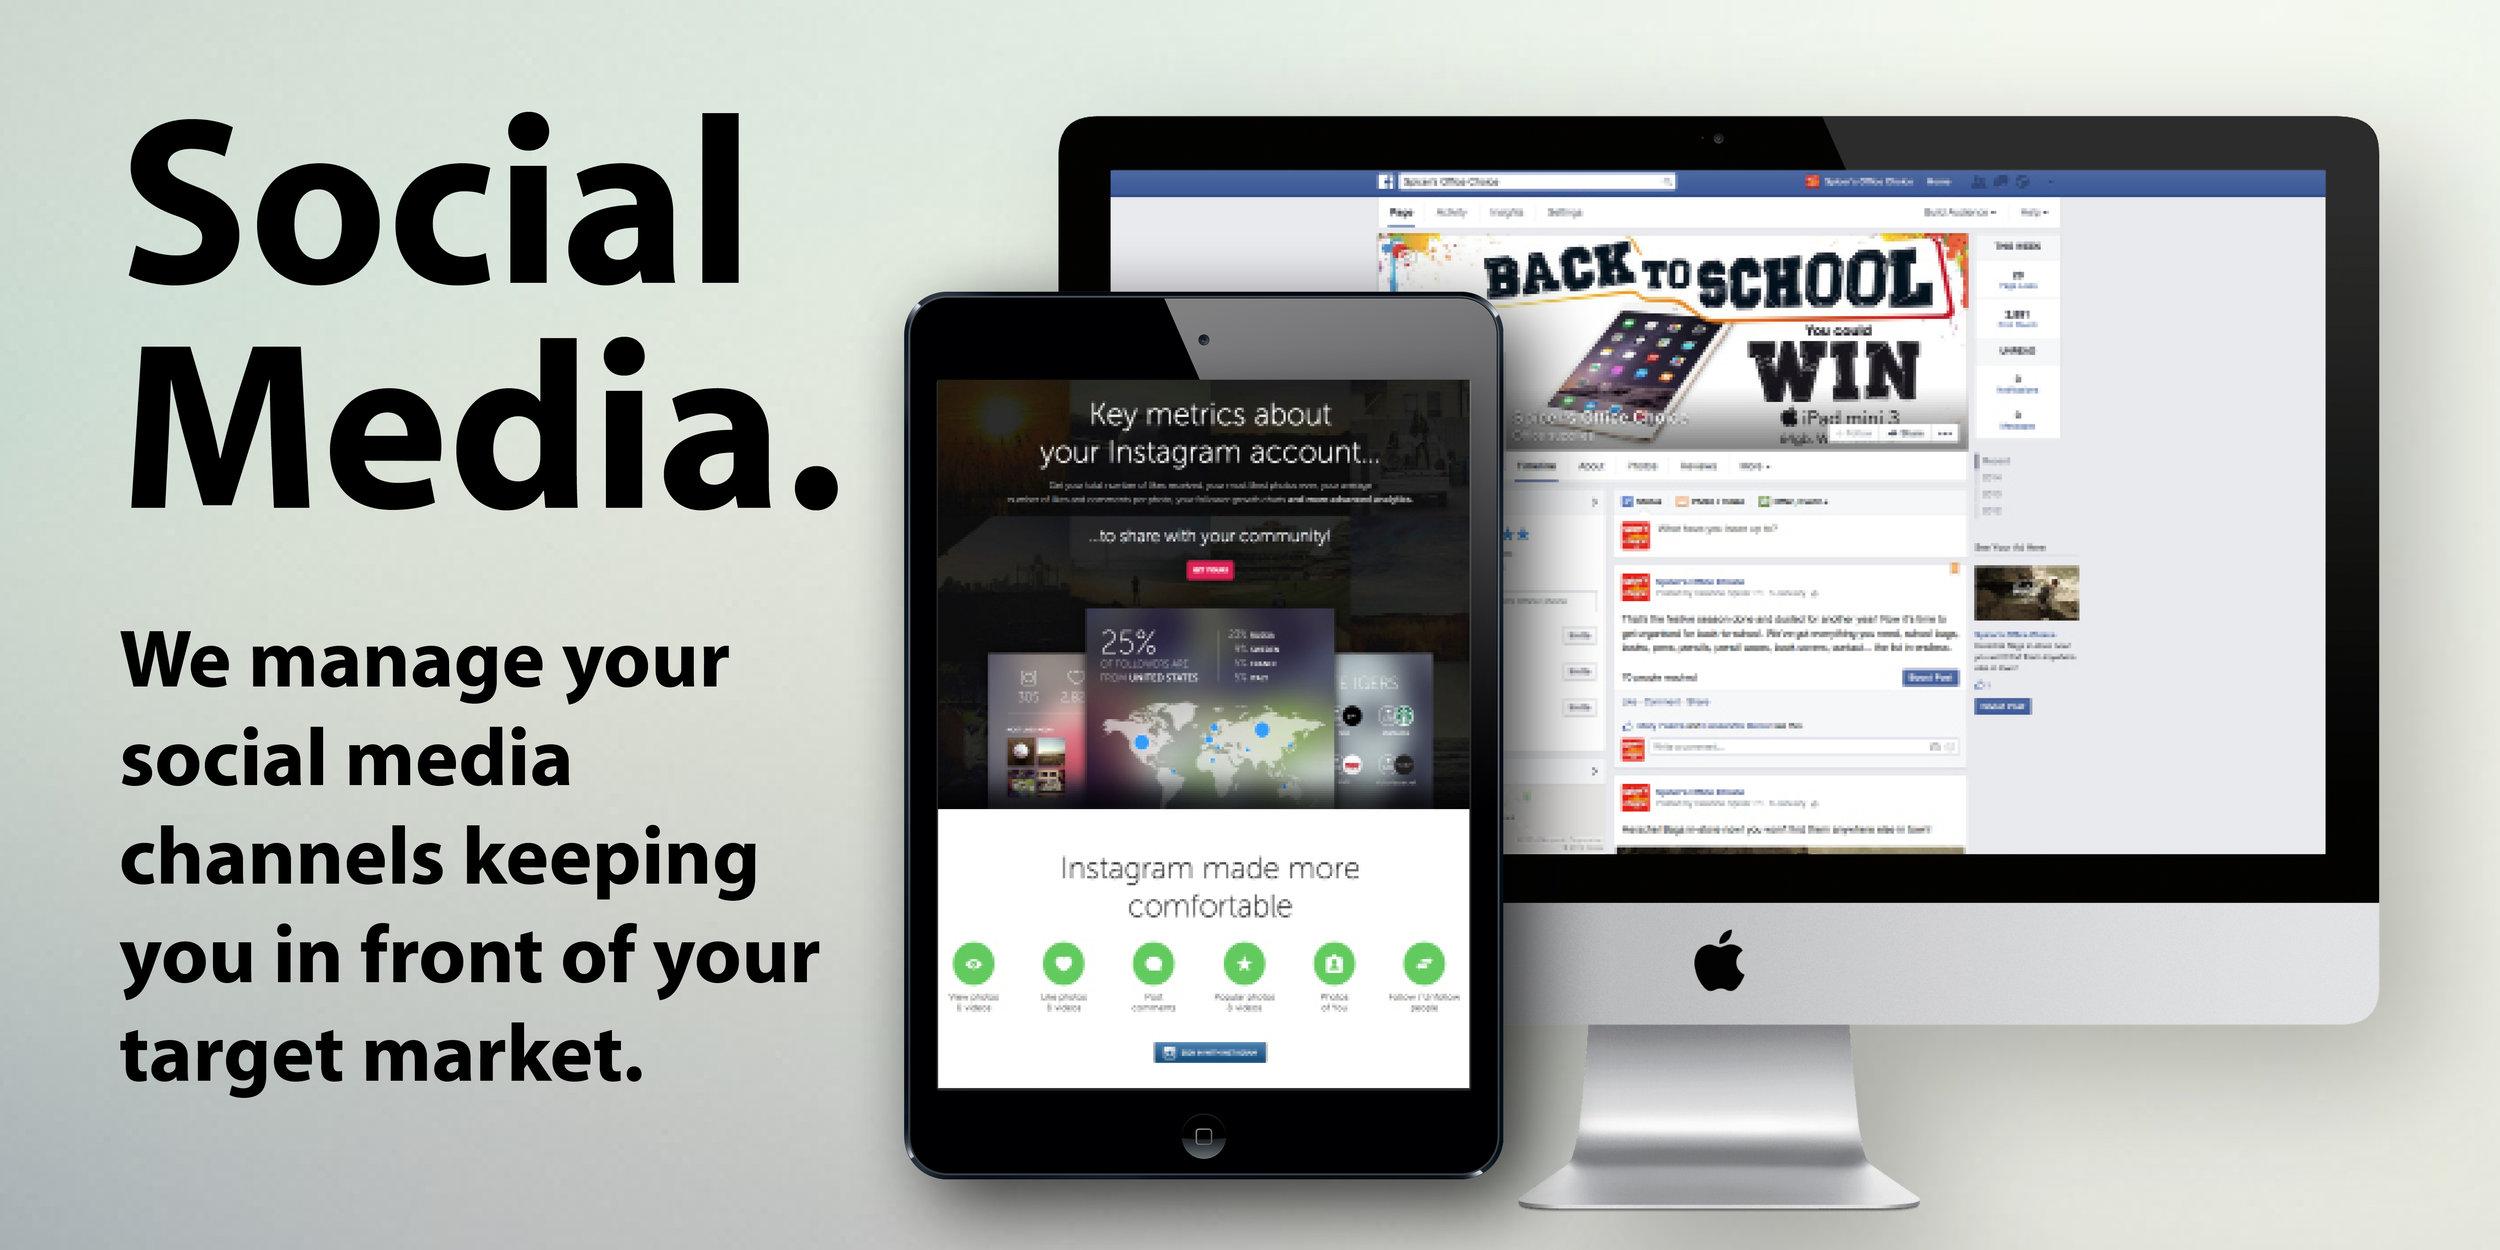 Brandsuite social media management